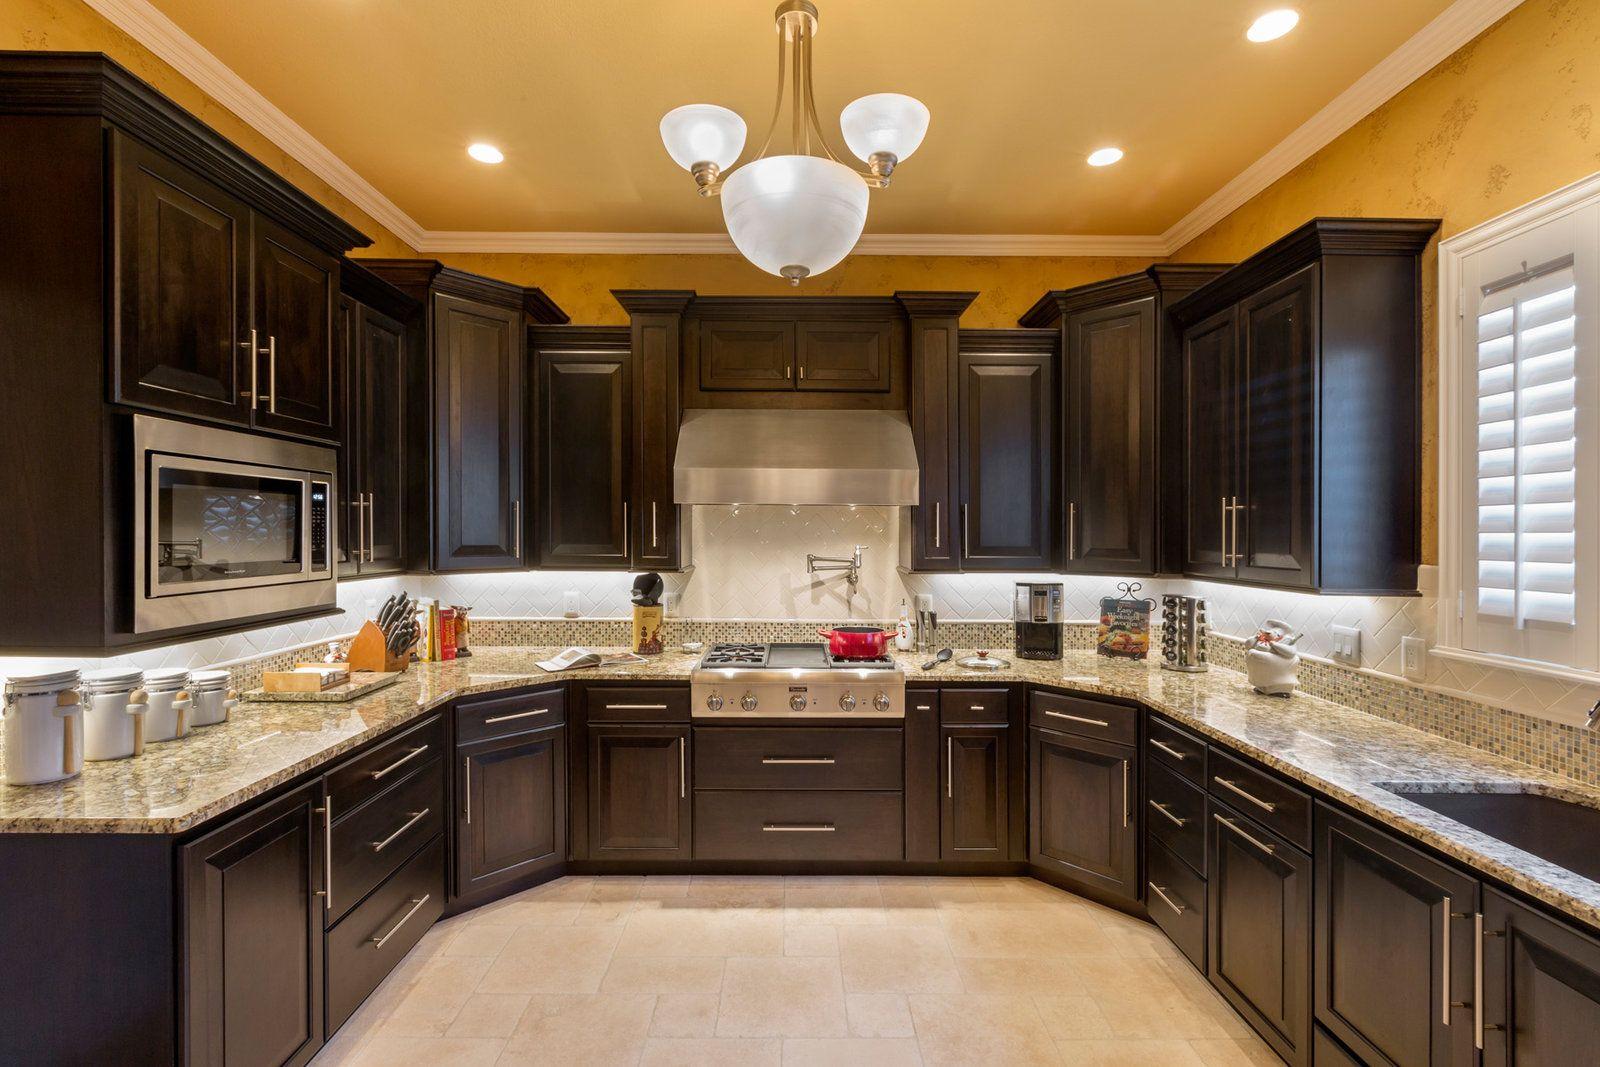 traditional kitchen giallo fiorito granite counters dewils traditional kitchen giallo fiorito granite counters dewils cabinets cherry wood style vanport